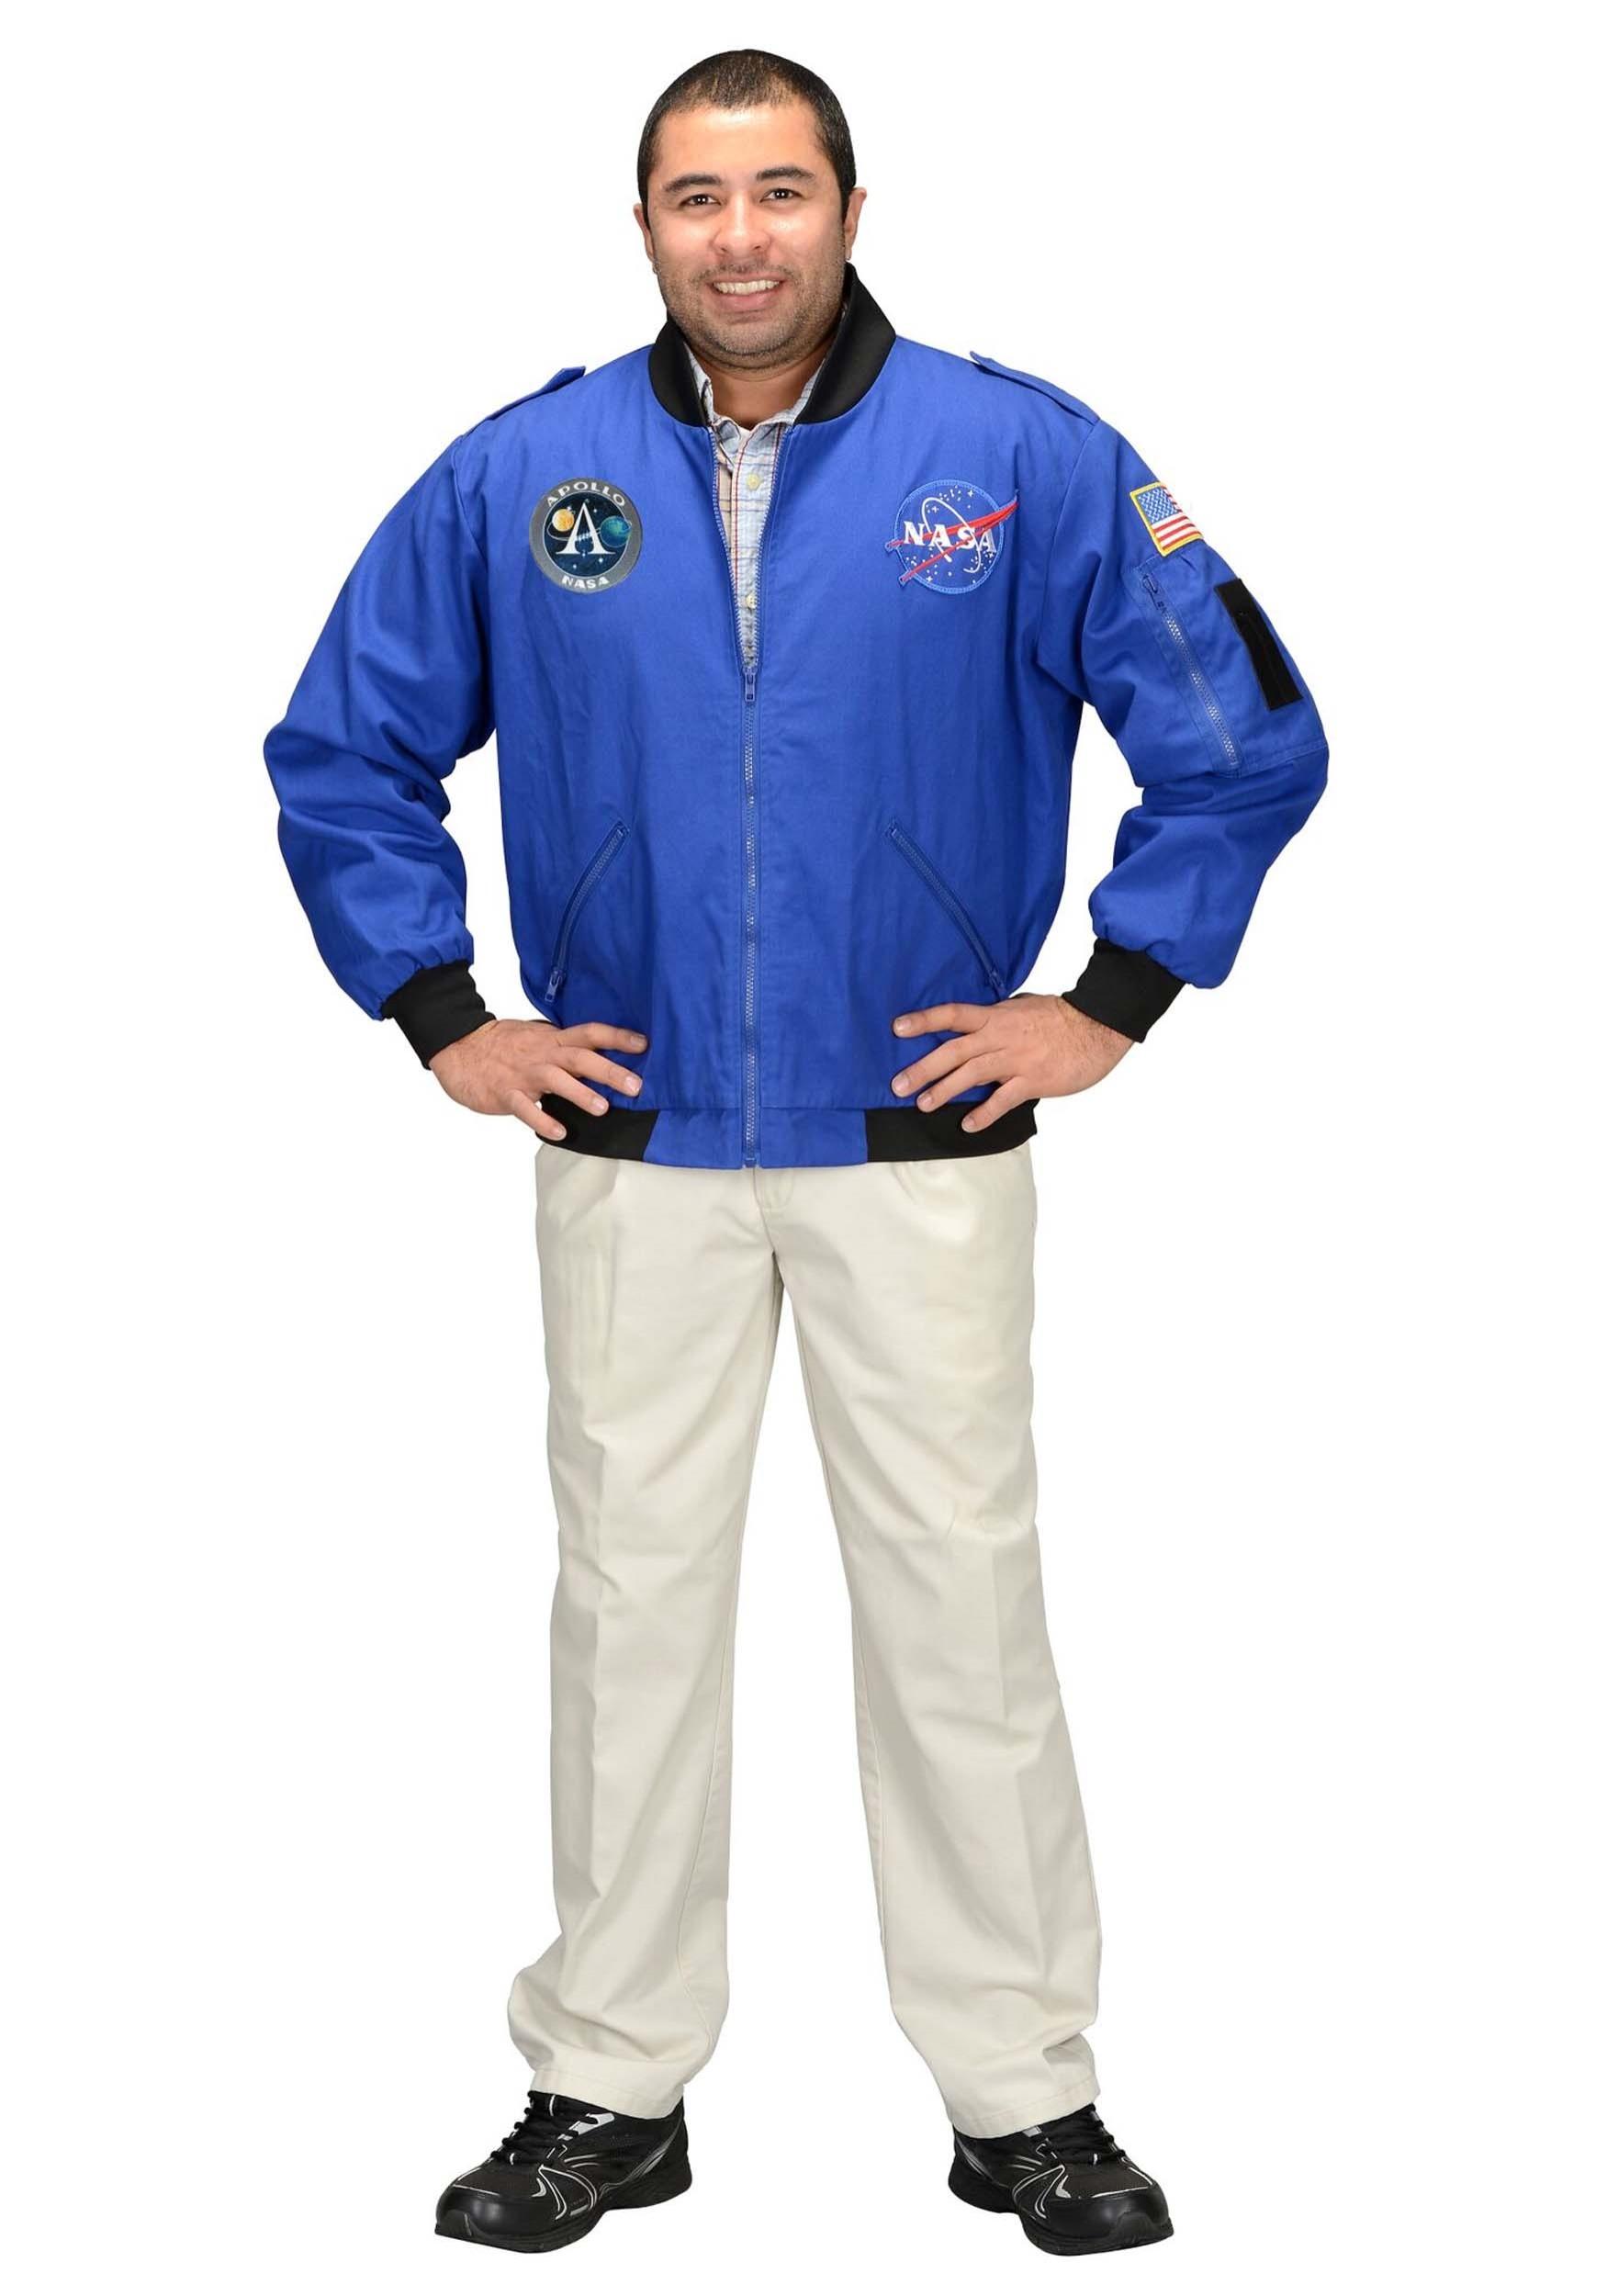 nasa apollo flight jacket - photo #16